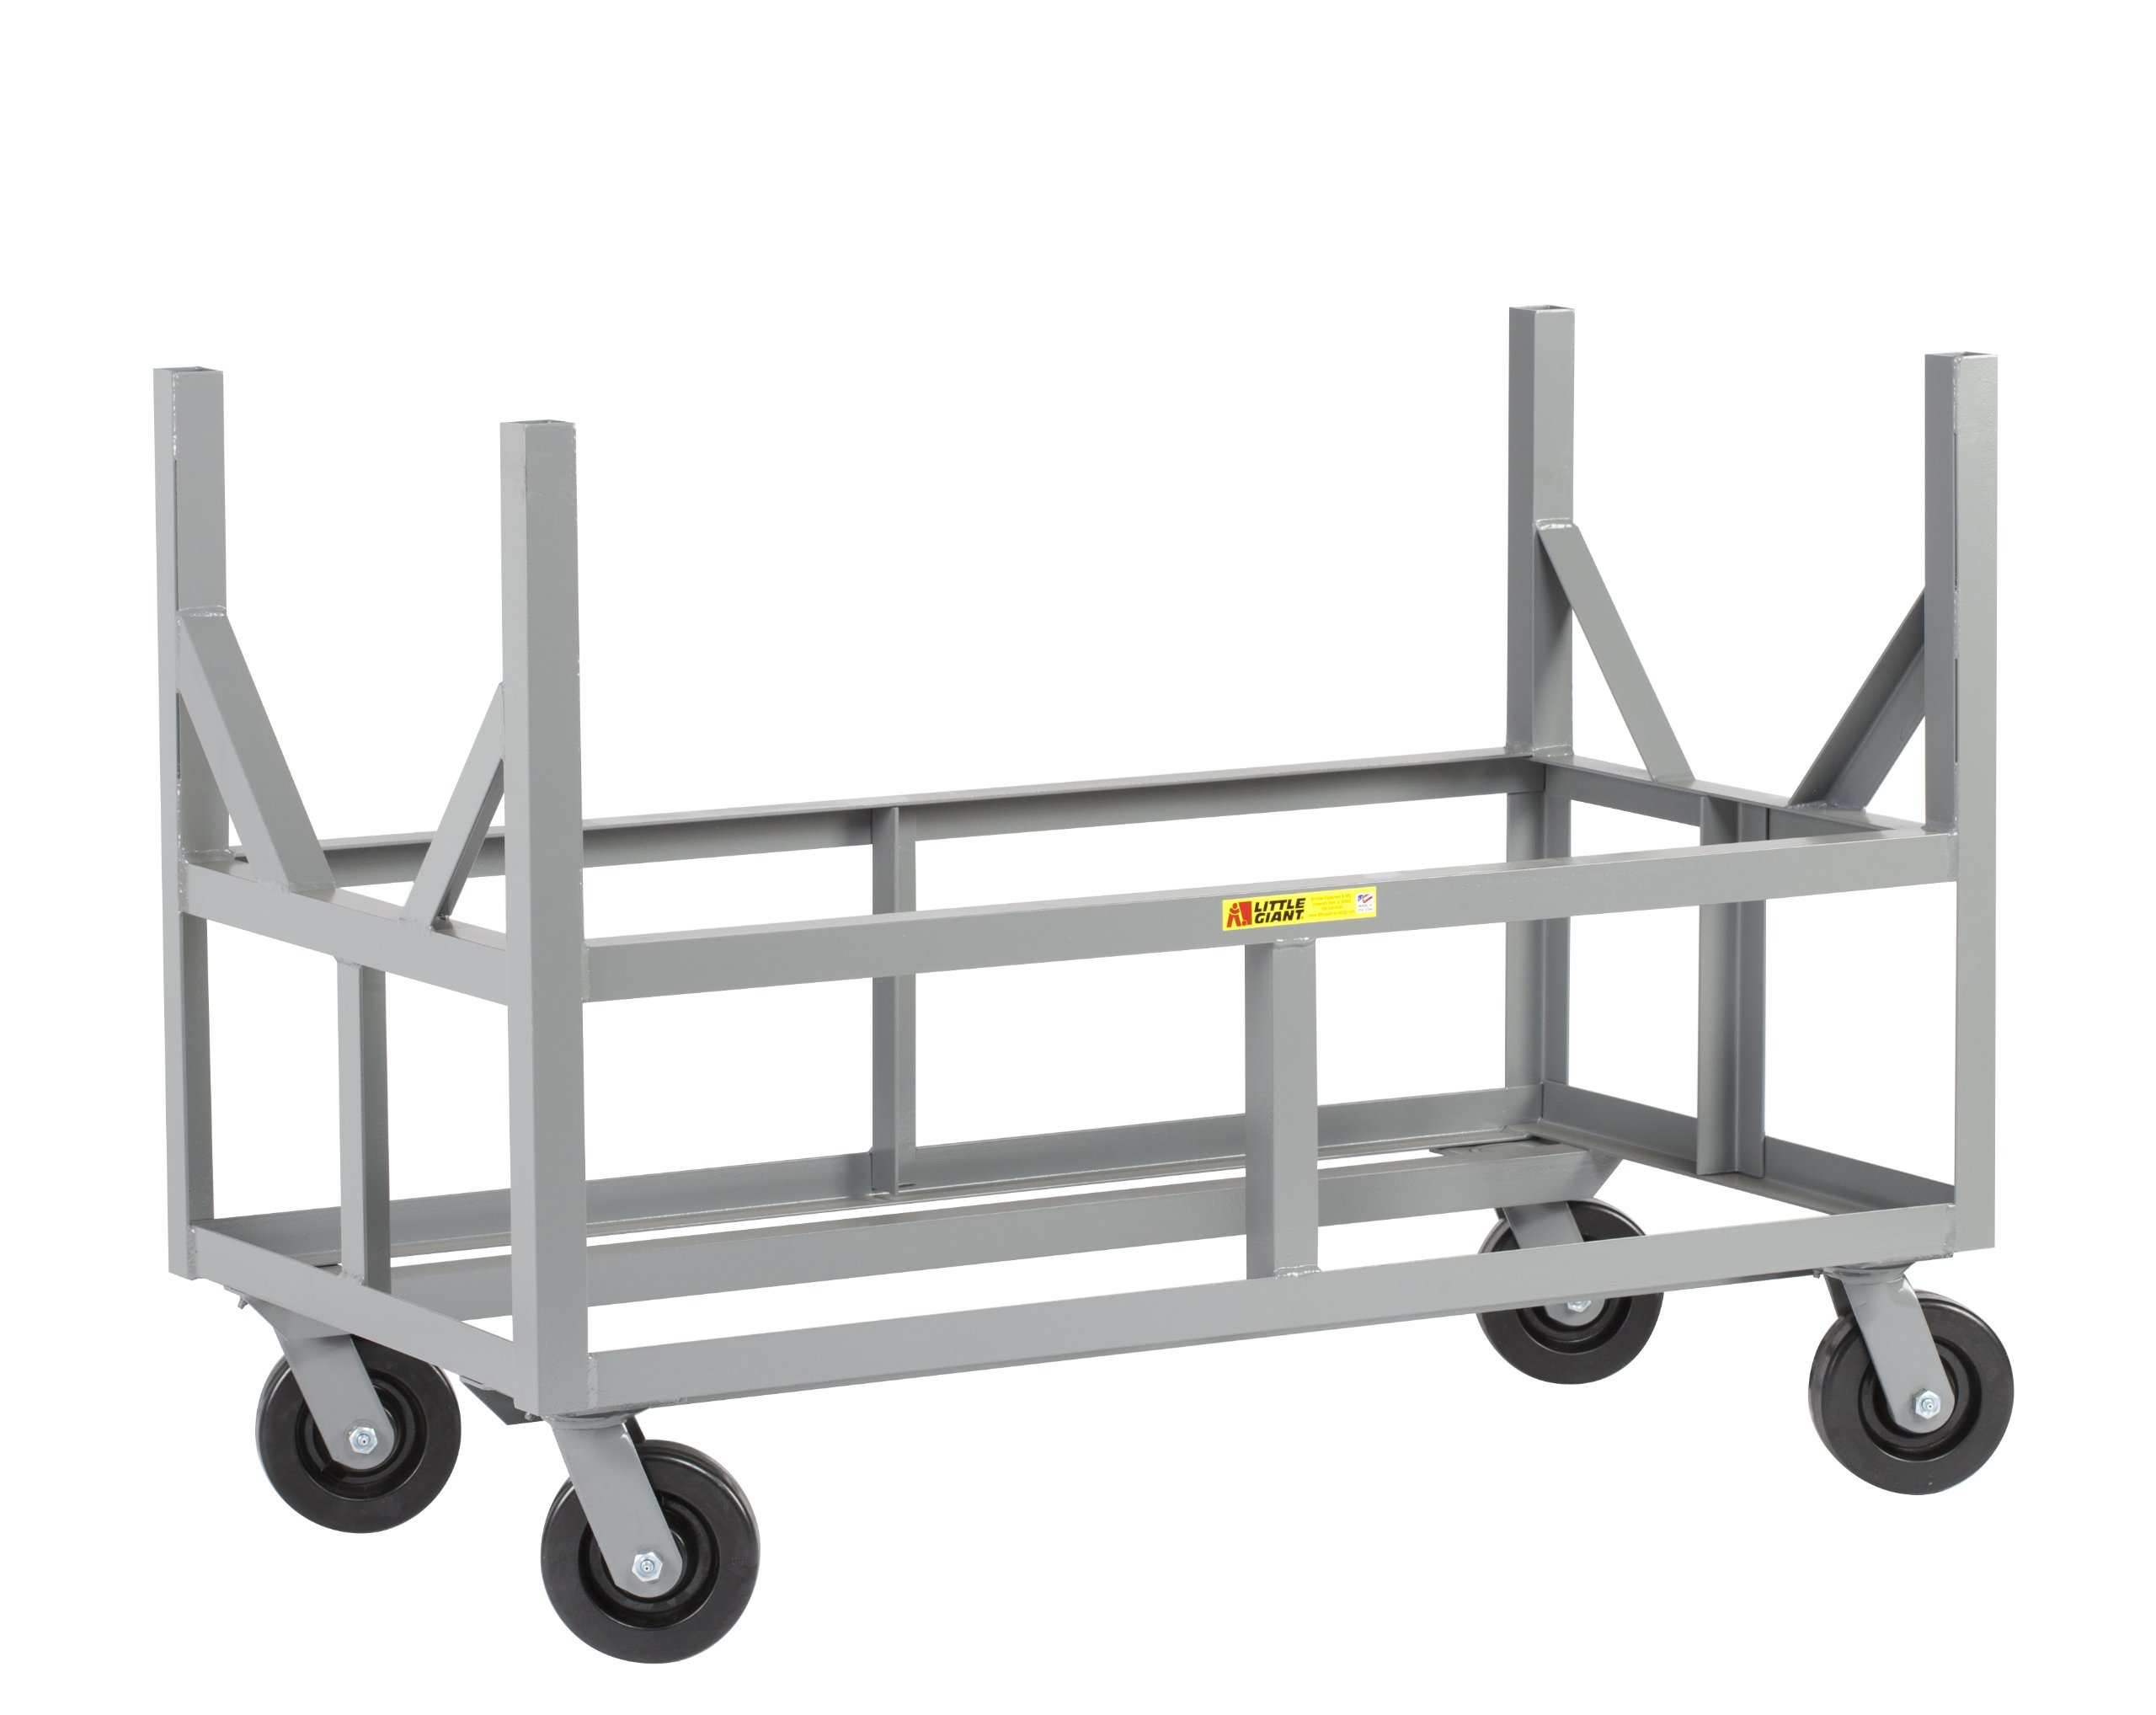 Little Giant ERBST-2448-6PH Ergonomic Bar Cradle Truck, 3000 lbs Capacity, 48'' Length x 24'' Width x 34'' Height